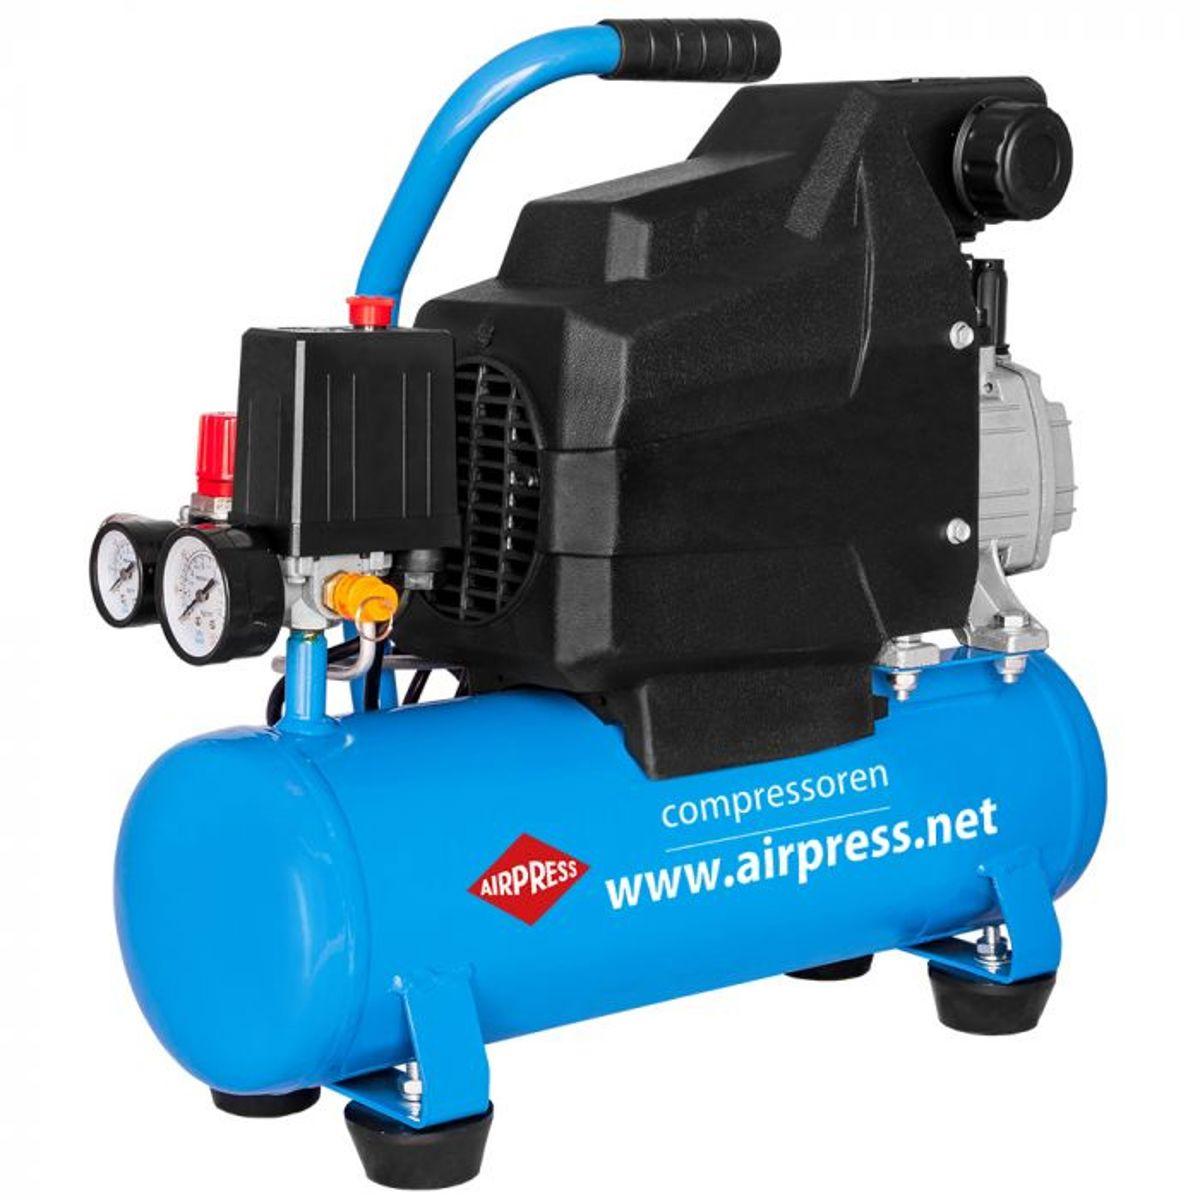 Airpress compressor h185/6 1.5pk